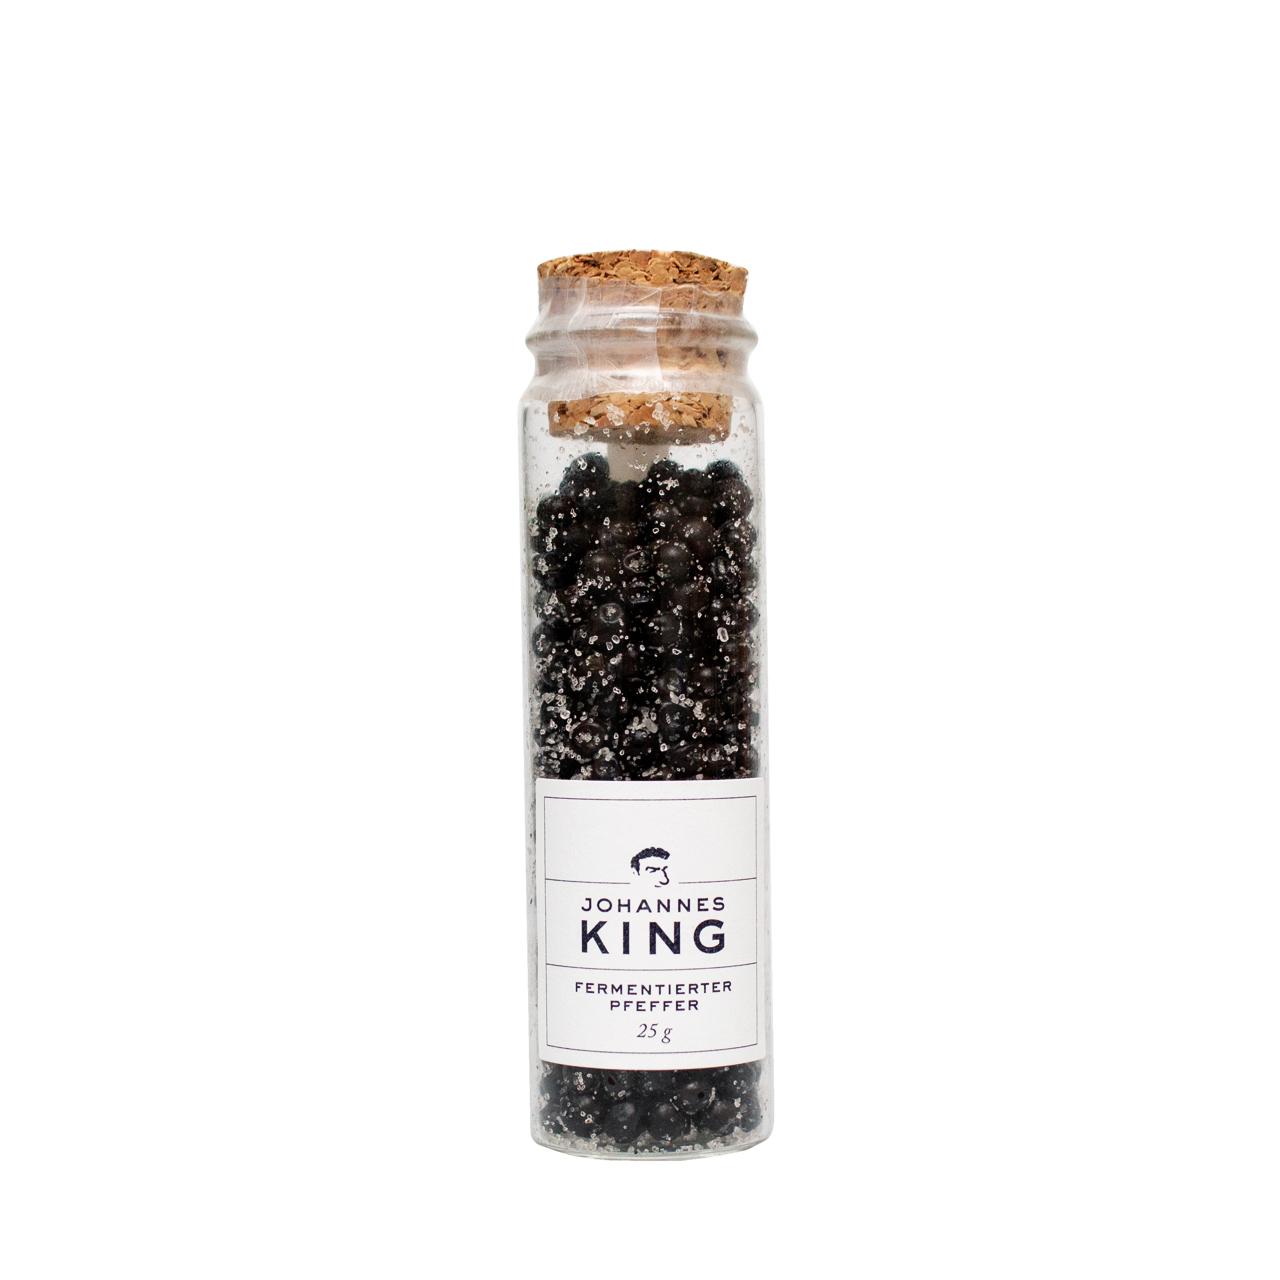 Kings Fermentierter Pfeffer